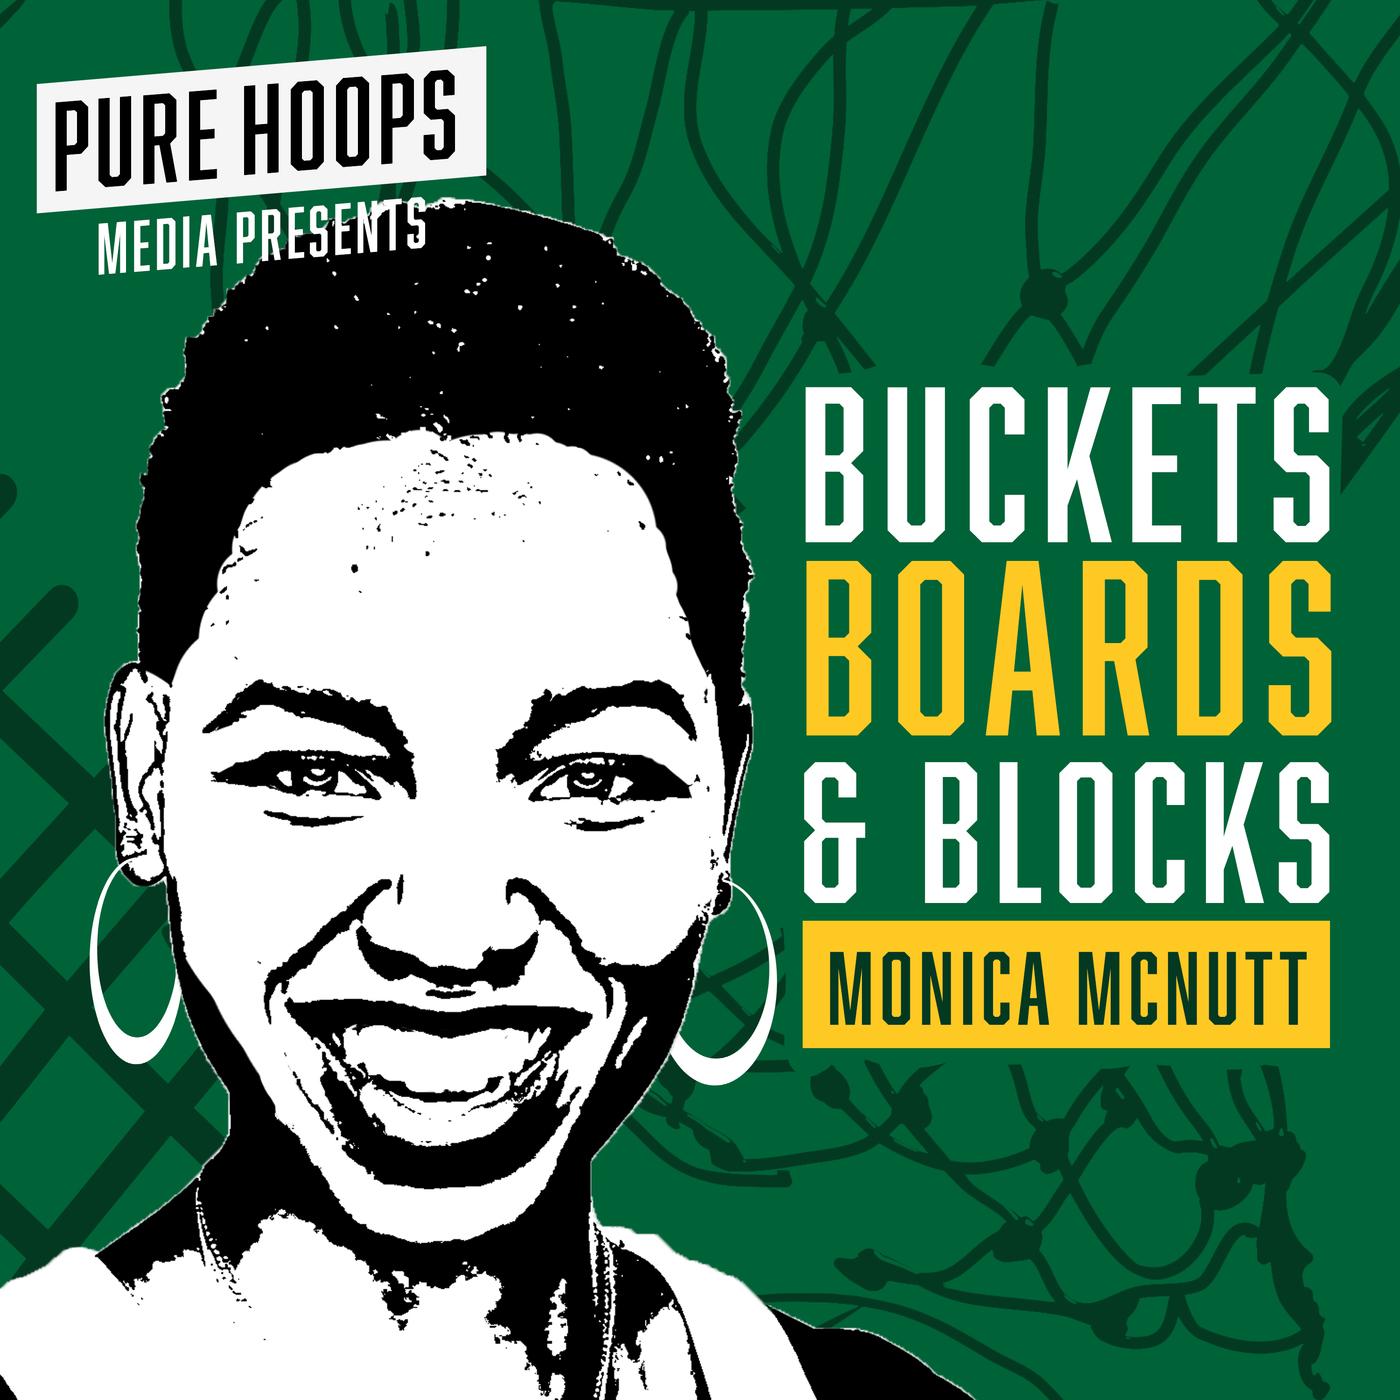 Buckets, Boards, and Blocks